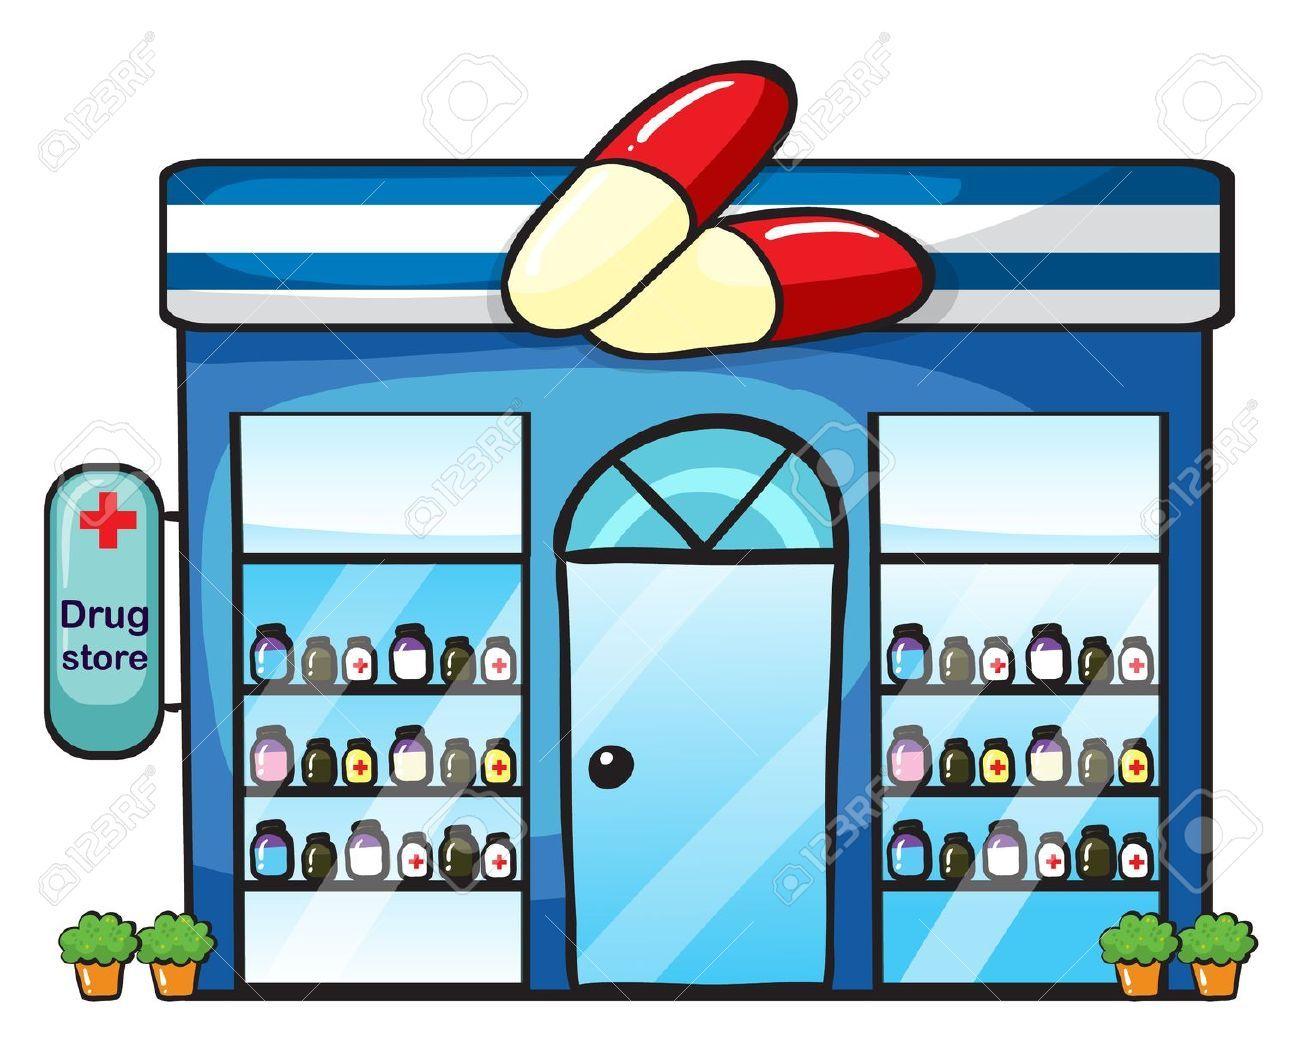 Pharmarcy clipart image freeuse stock Pharmacy clipart 5 » Clipart Portal image freeuse stock